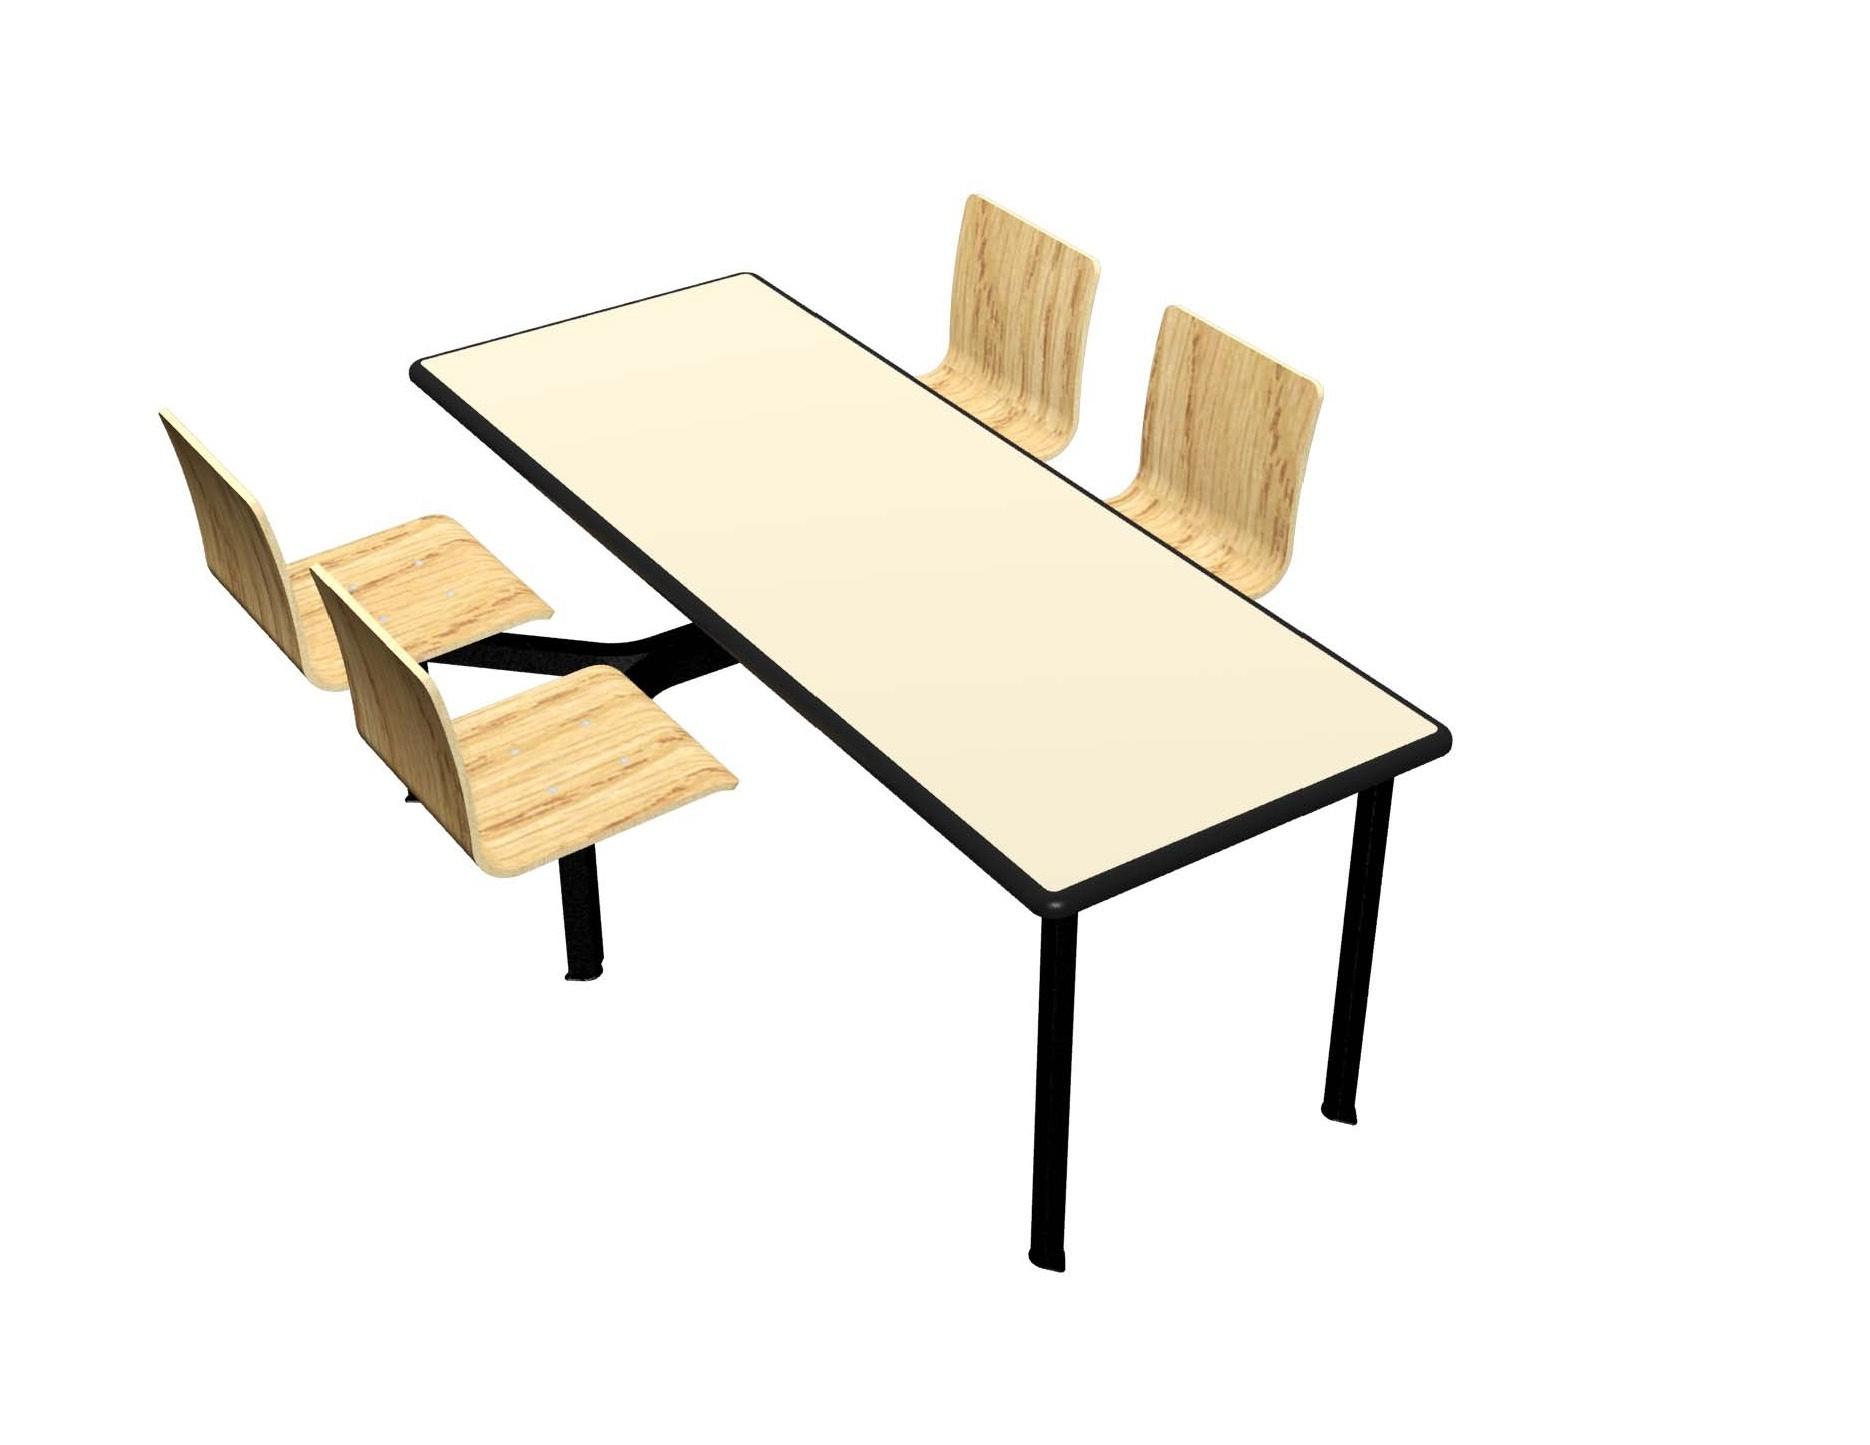 Wallaby laminate table, Black Dur-A-Edge®, Legacy chairhead in Natural Oak laminate